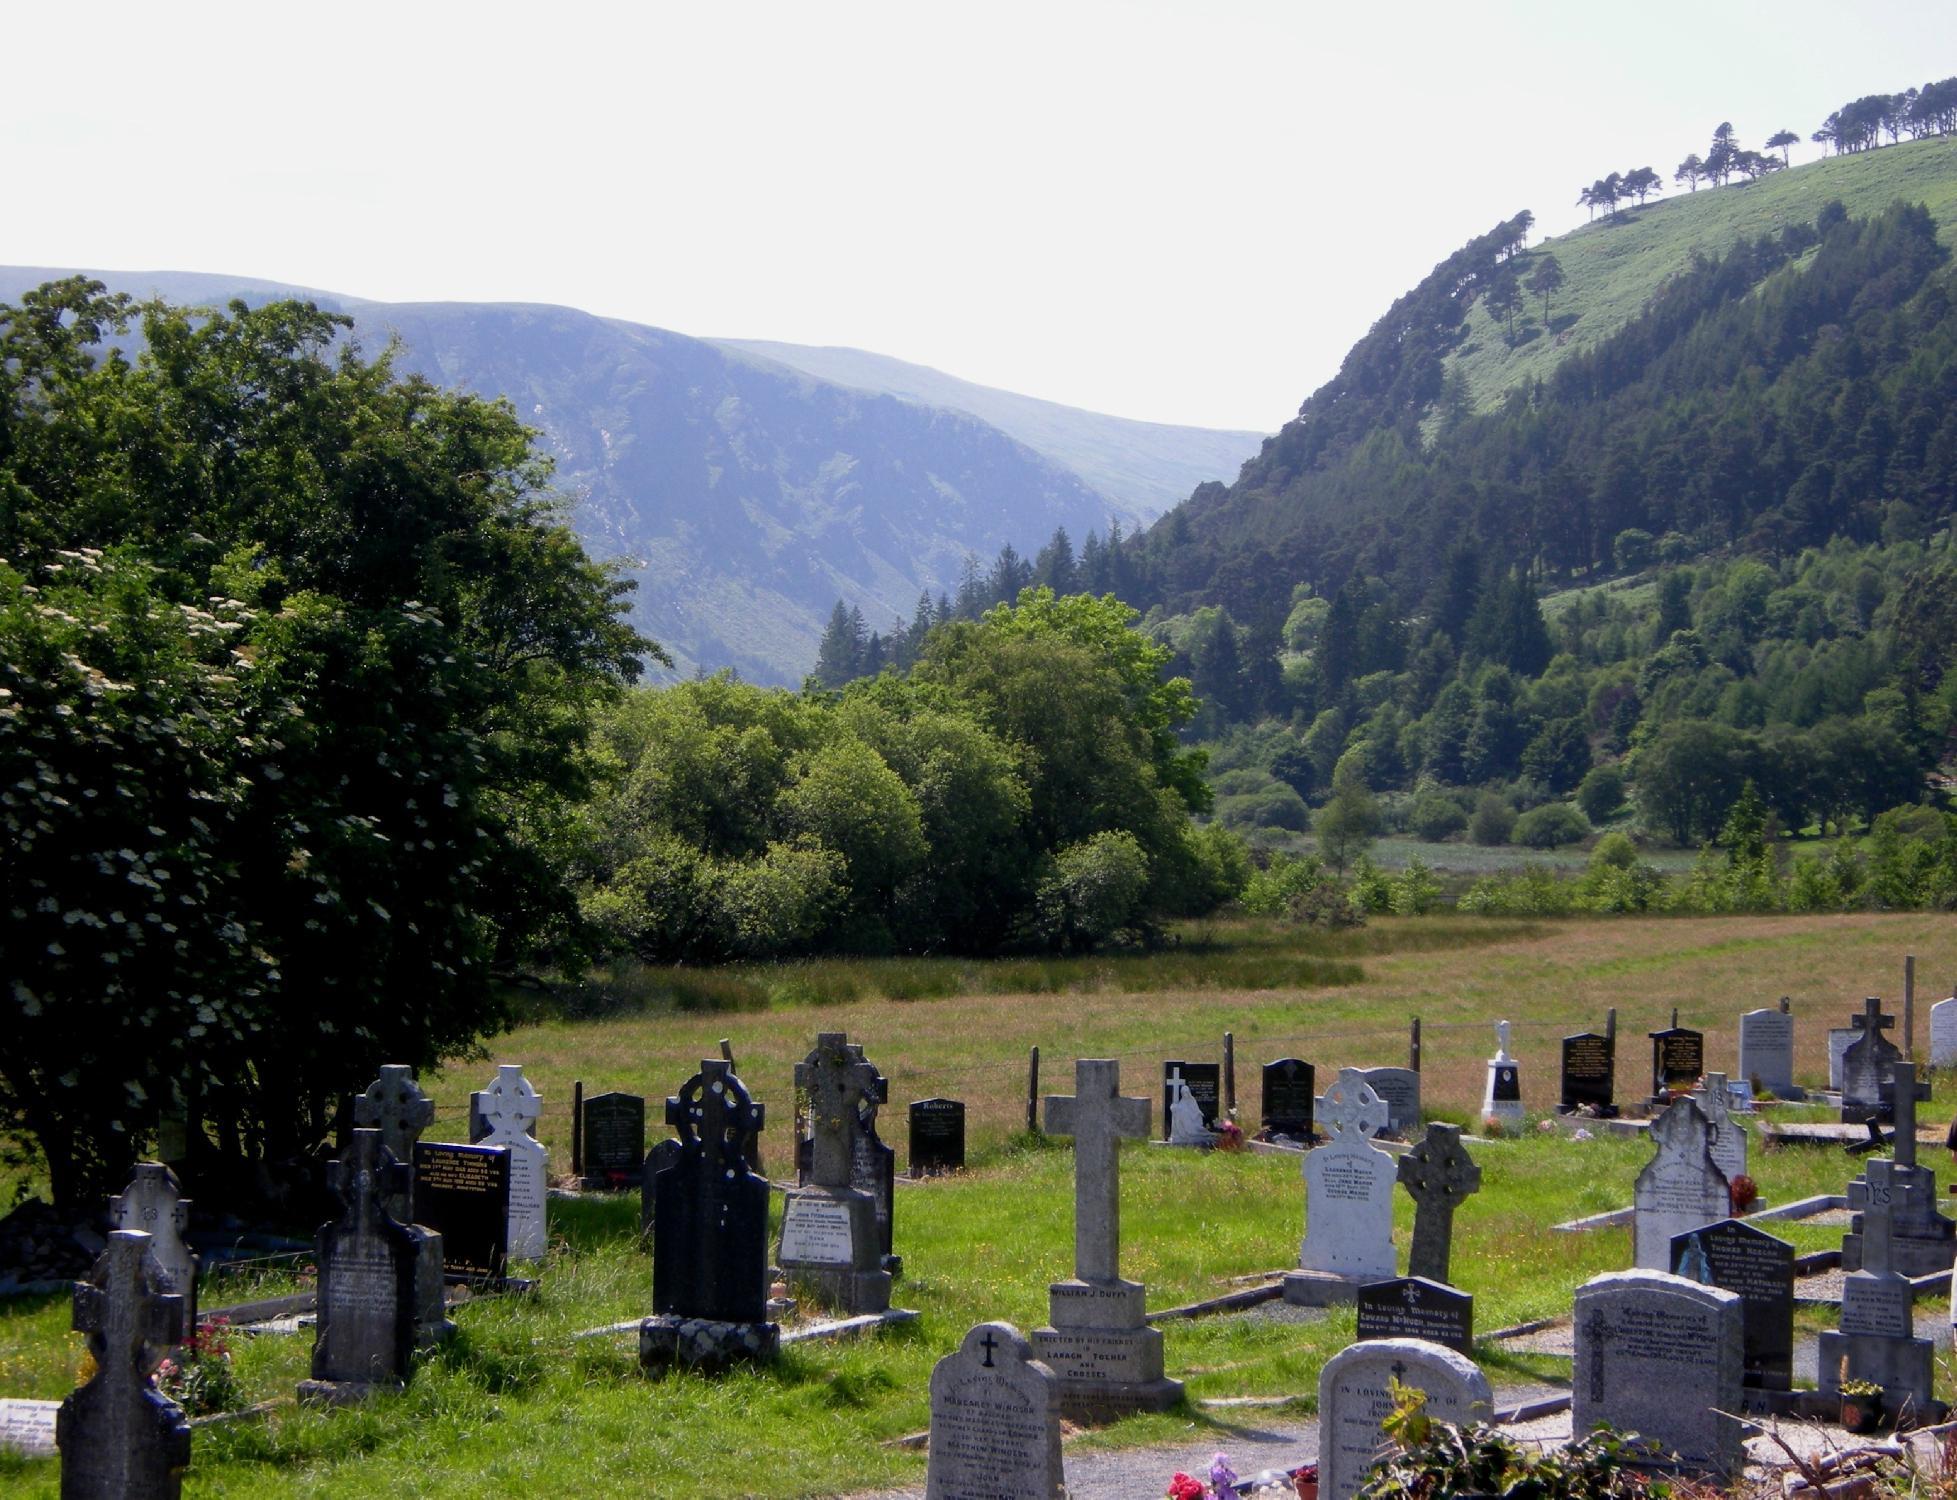 The 6th century monastic site of Glendalough